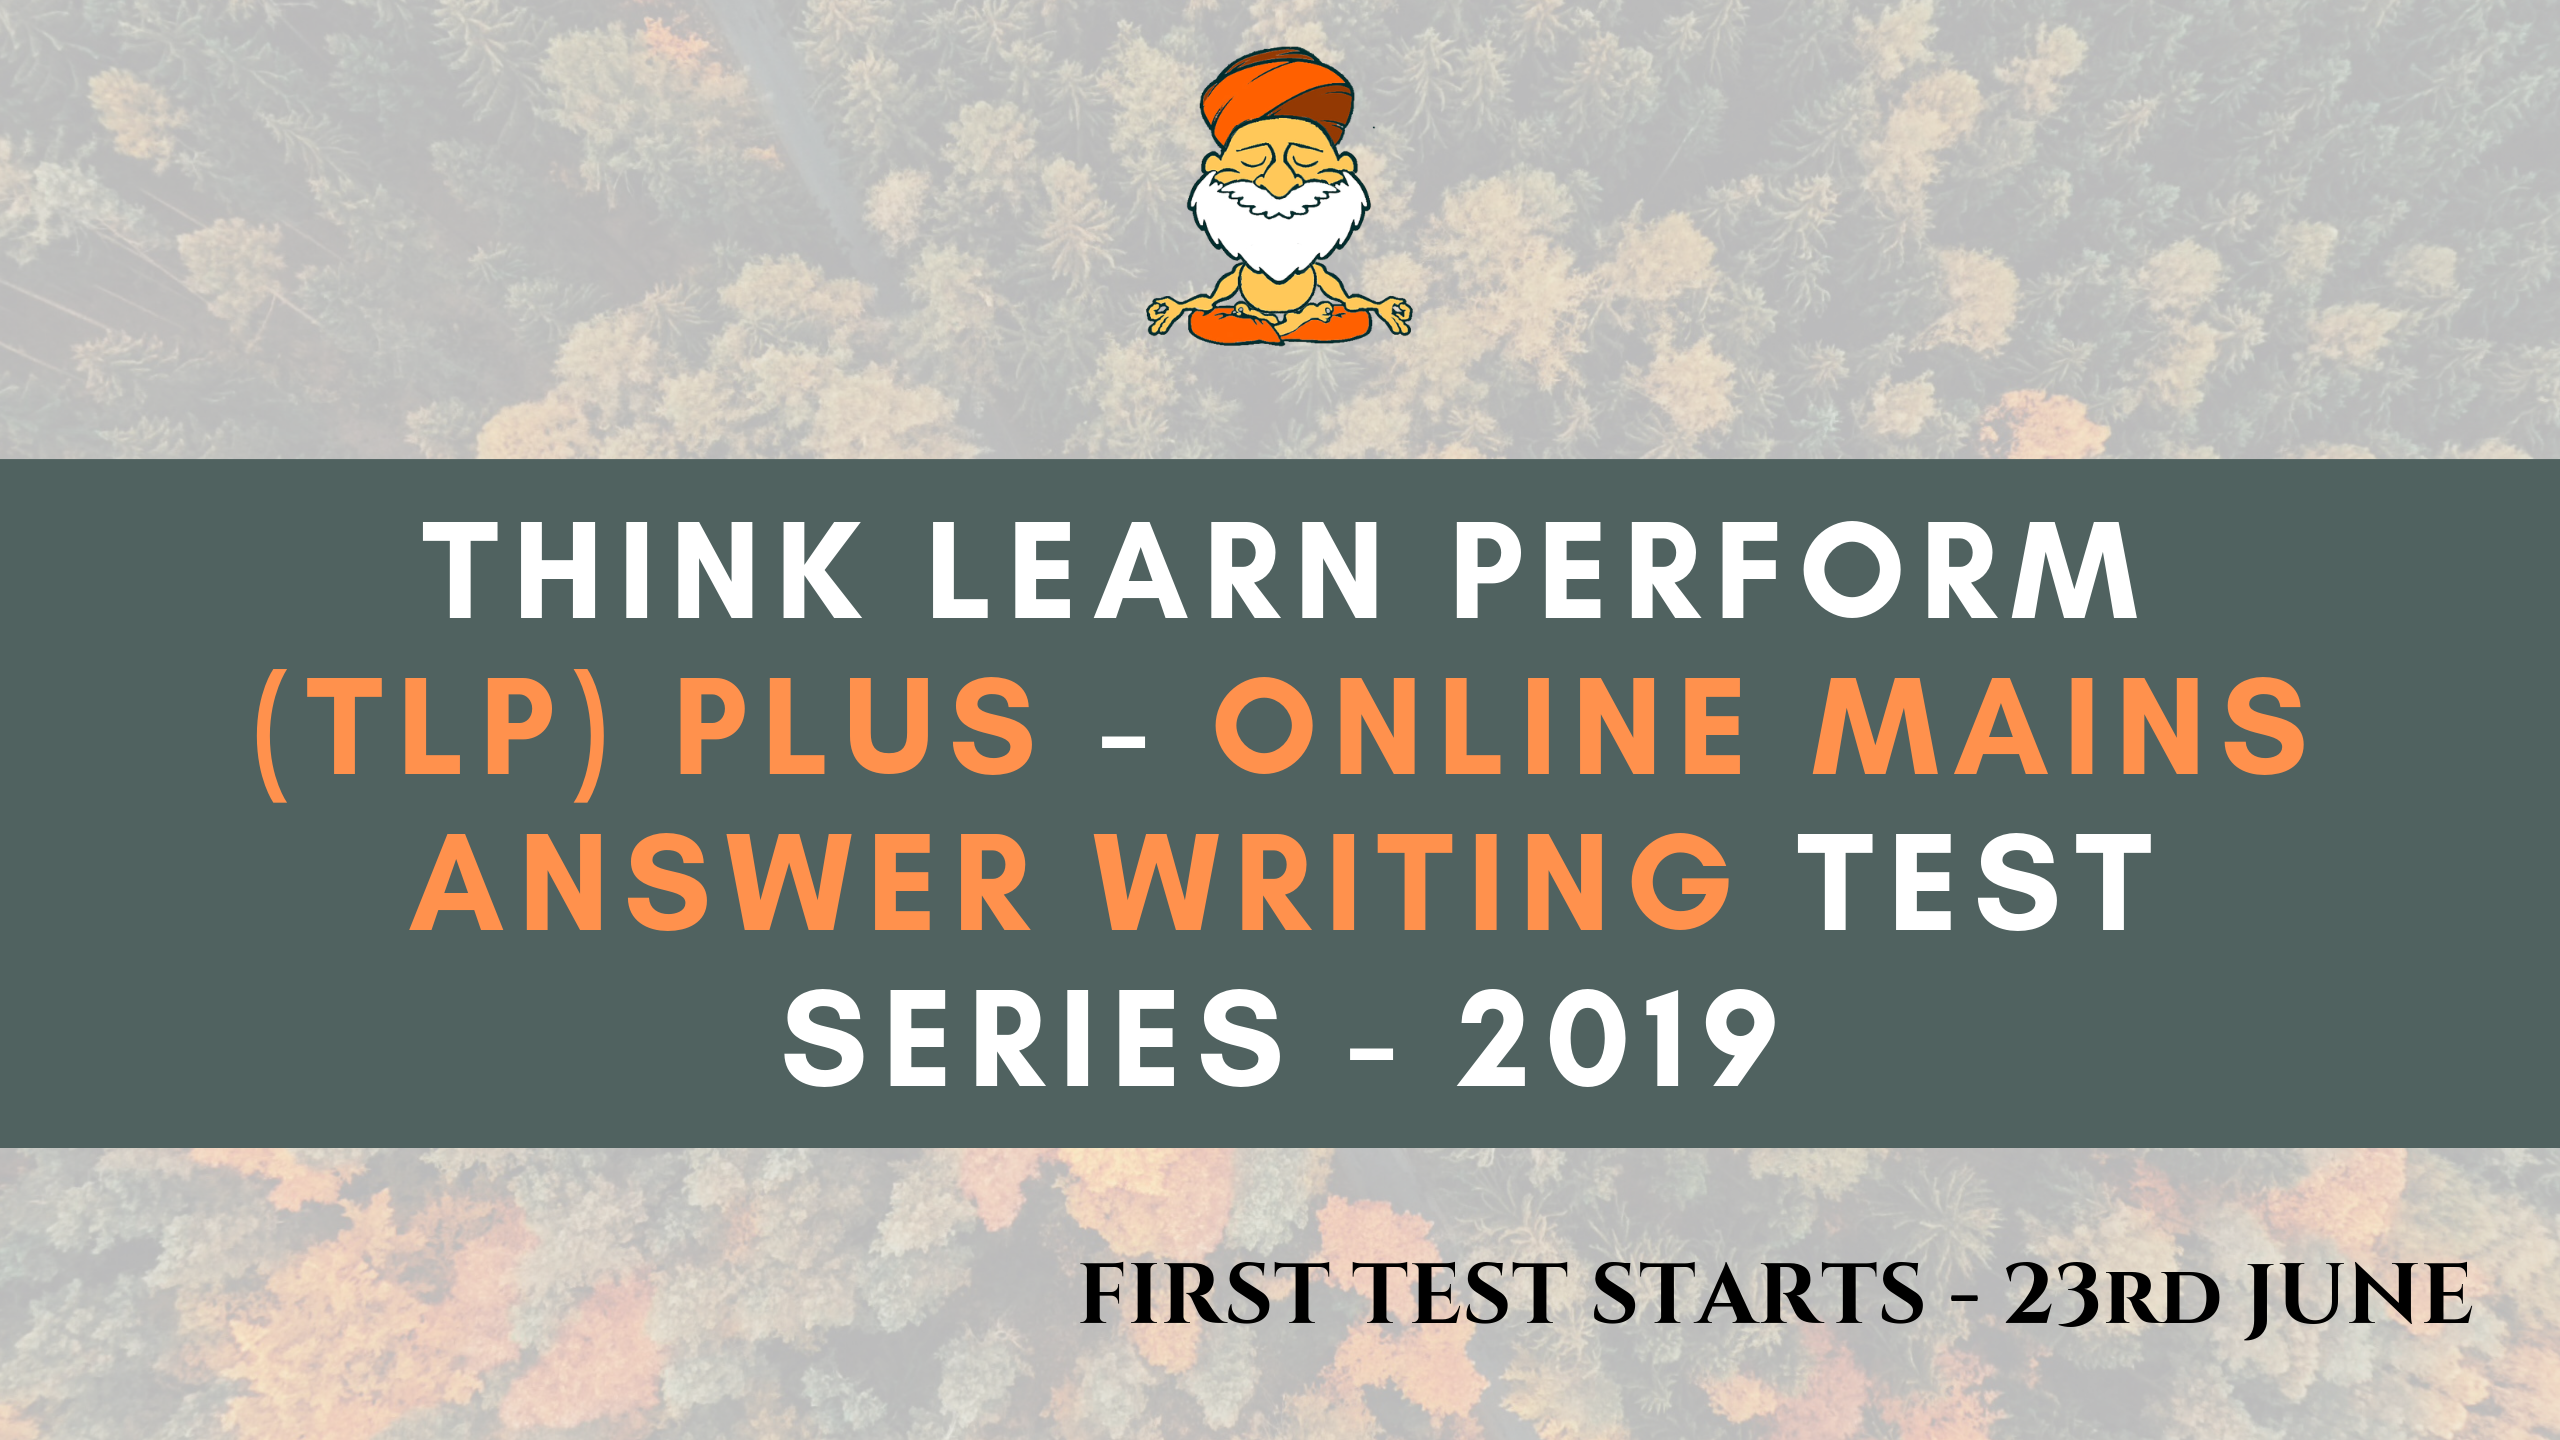 Quick Update: IASbaba's TLP PLUS – ONLINE MAINS Test Series